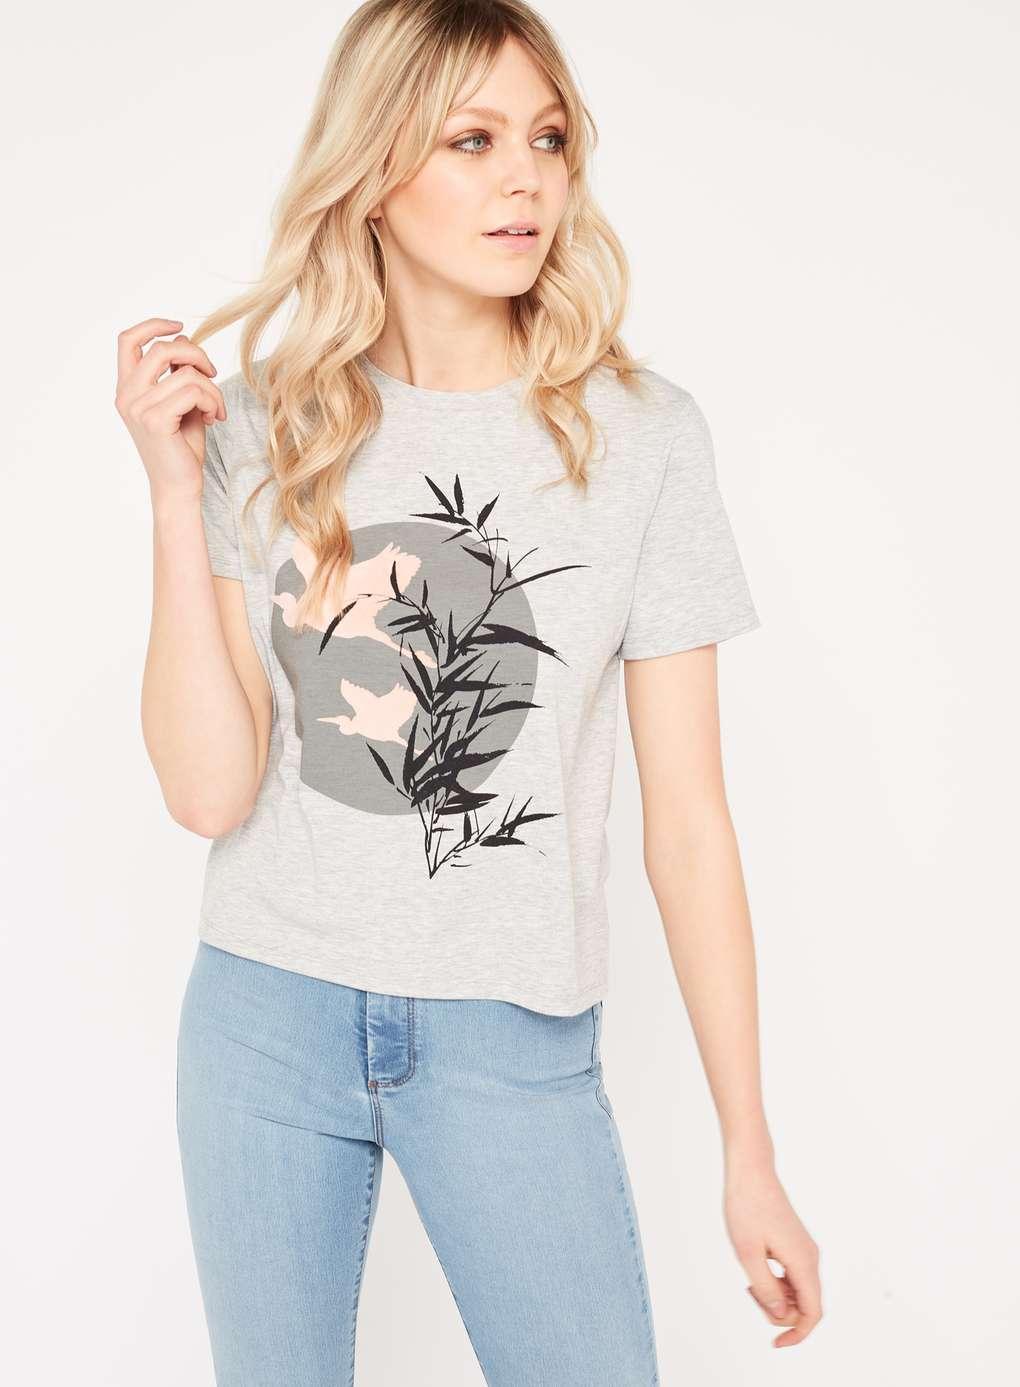 womens clothing shirts miss pink grey shirt